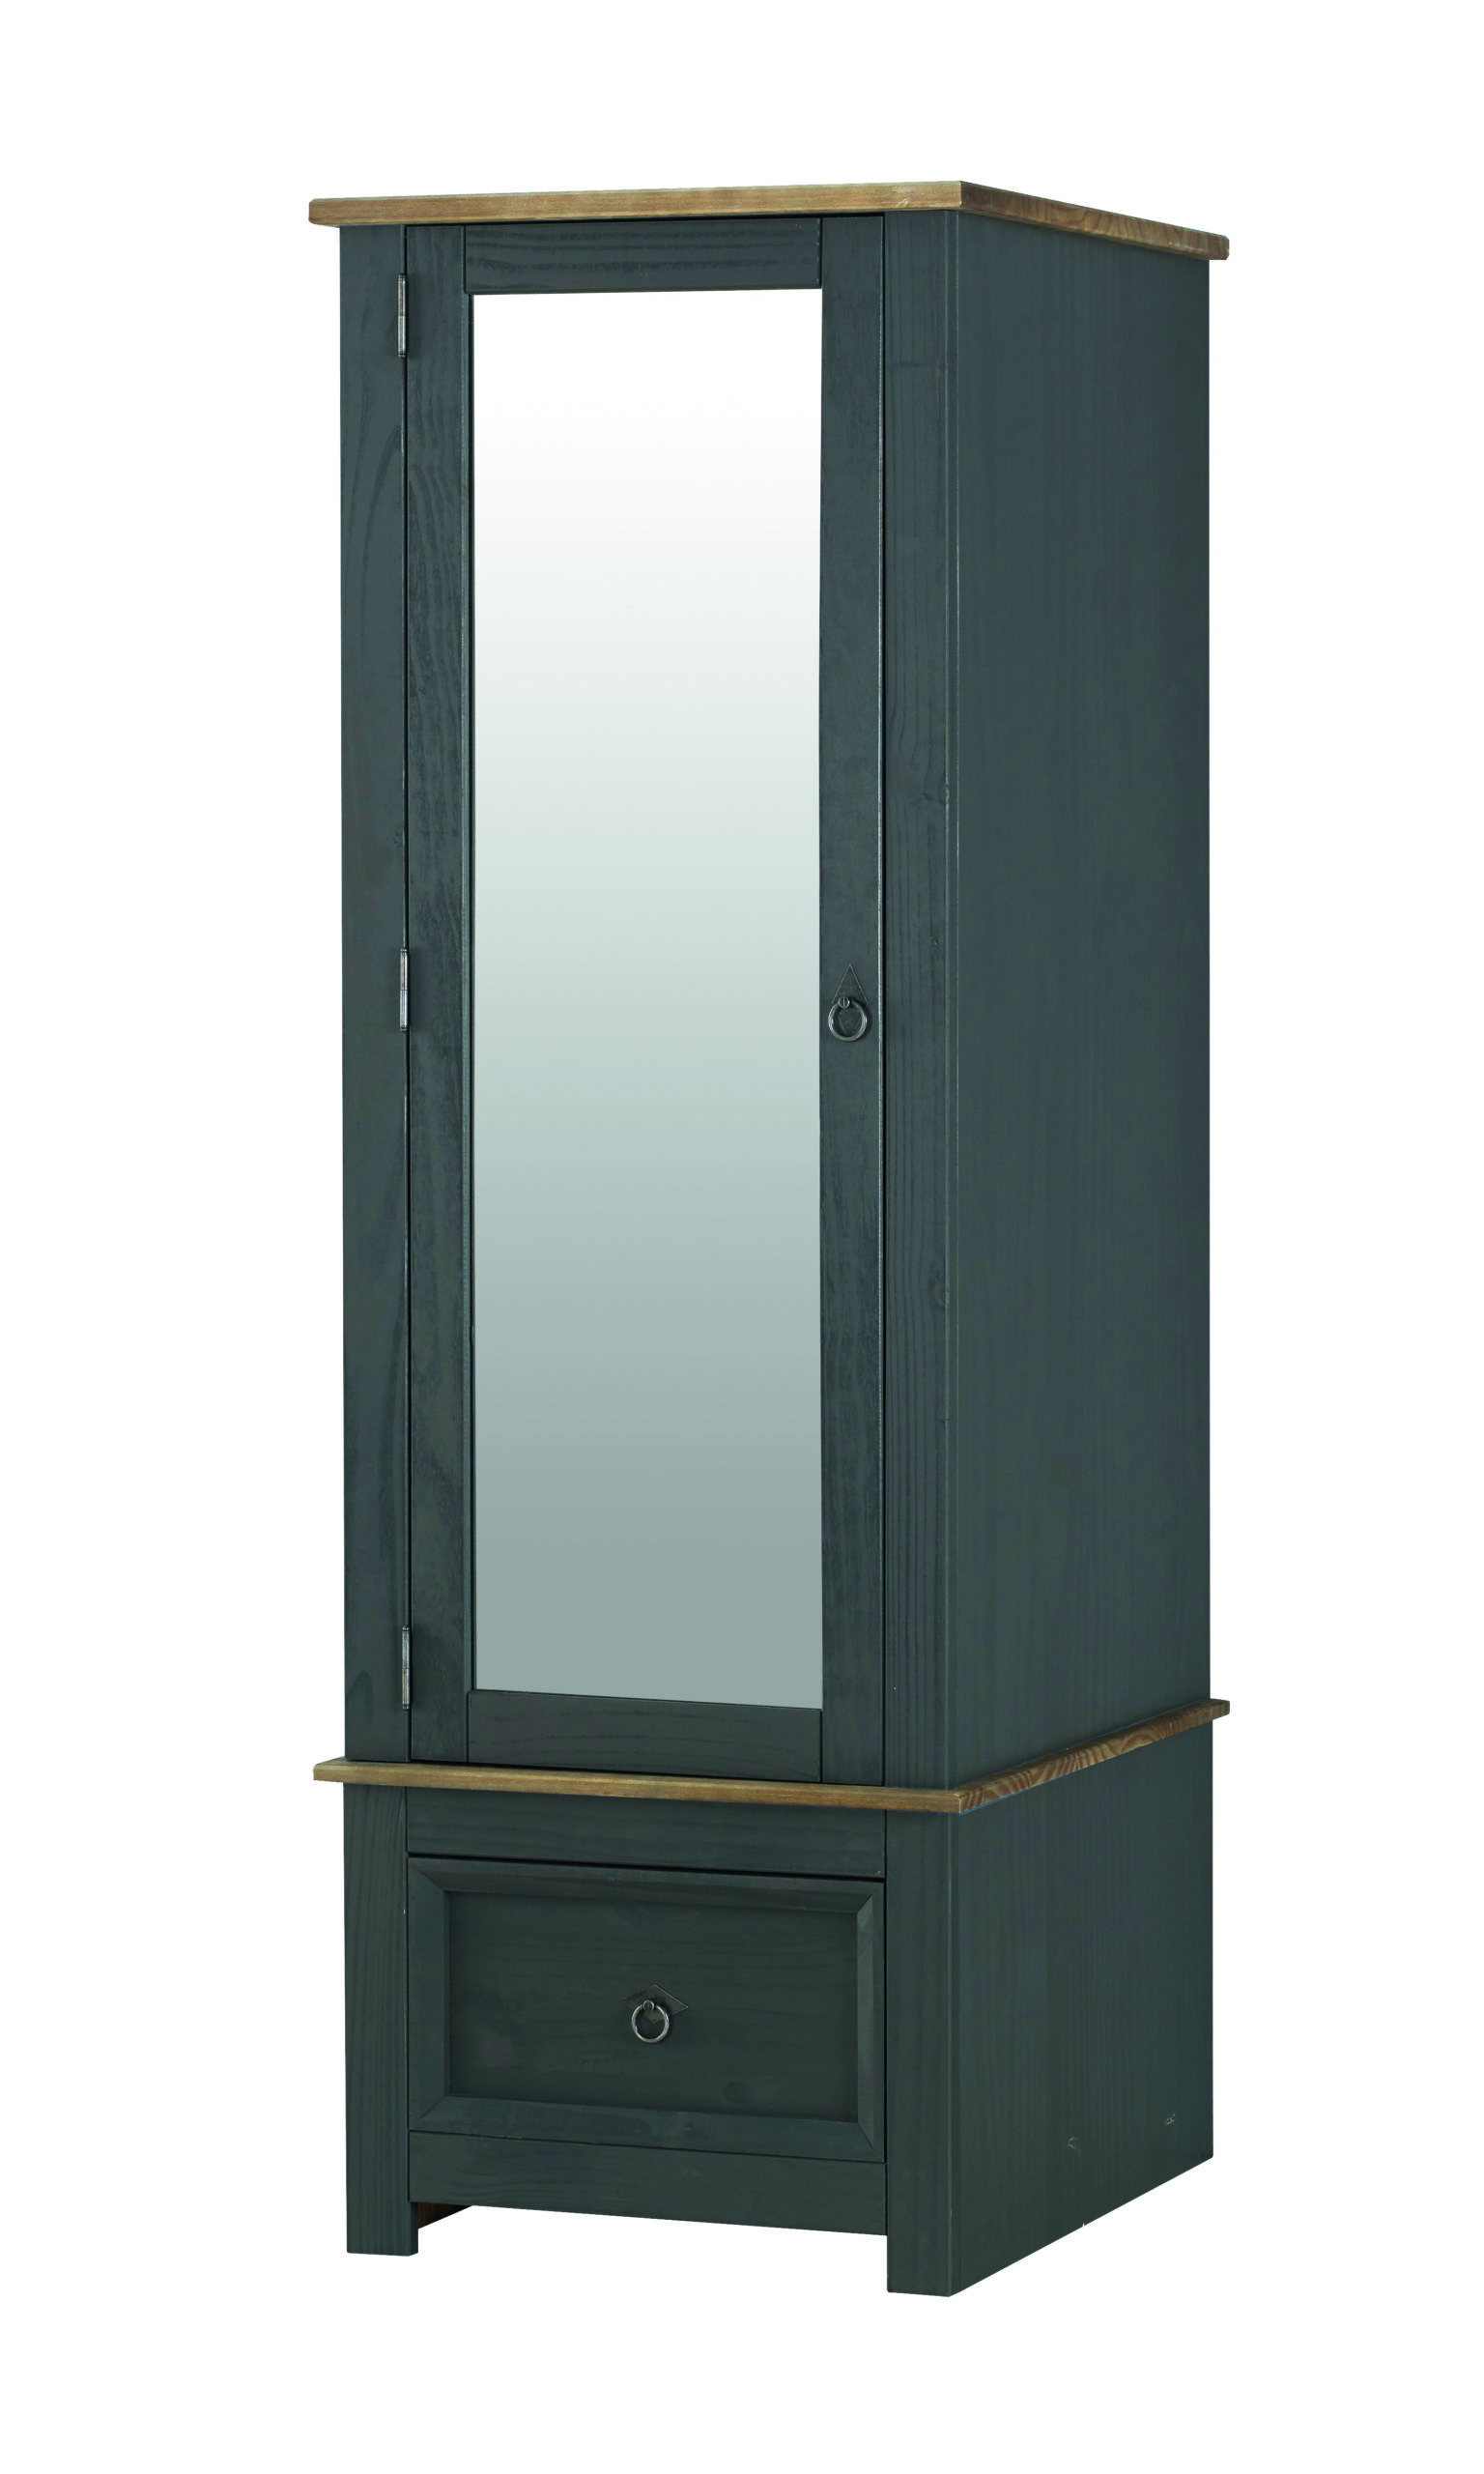 Caladonea Carbon armoire mirrored door